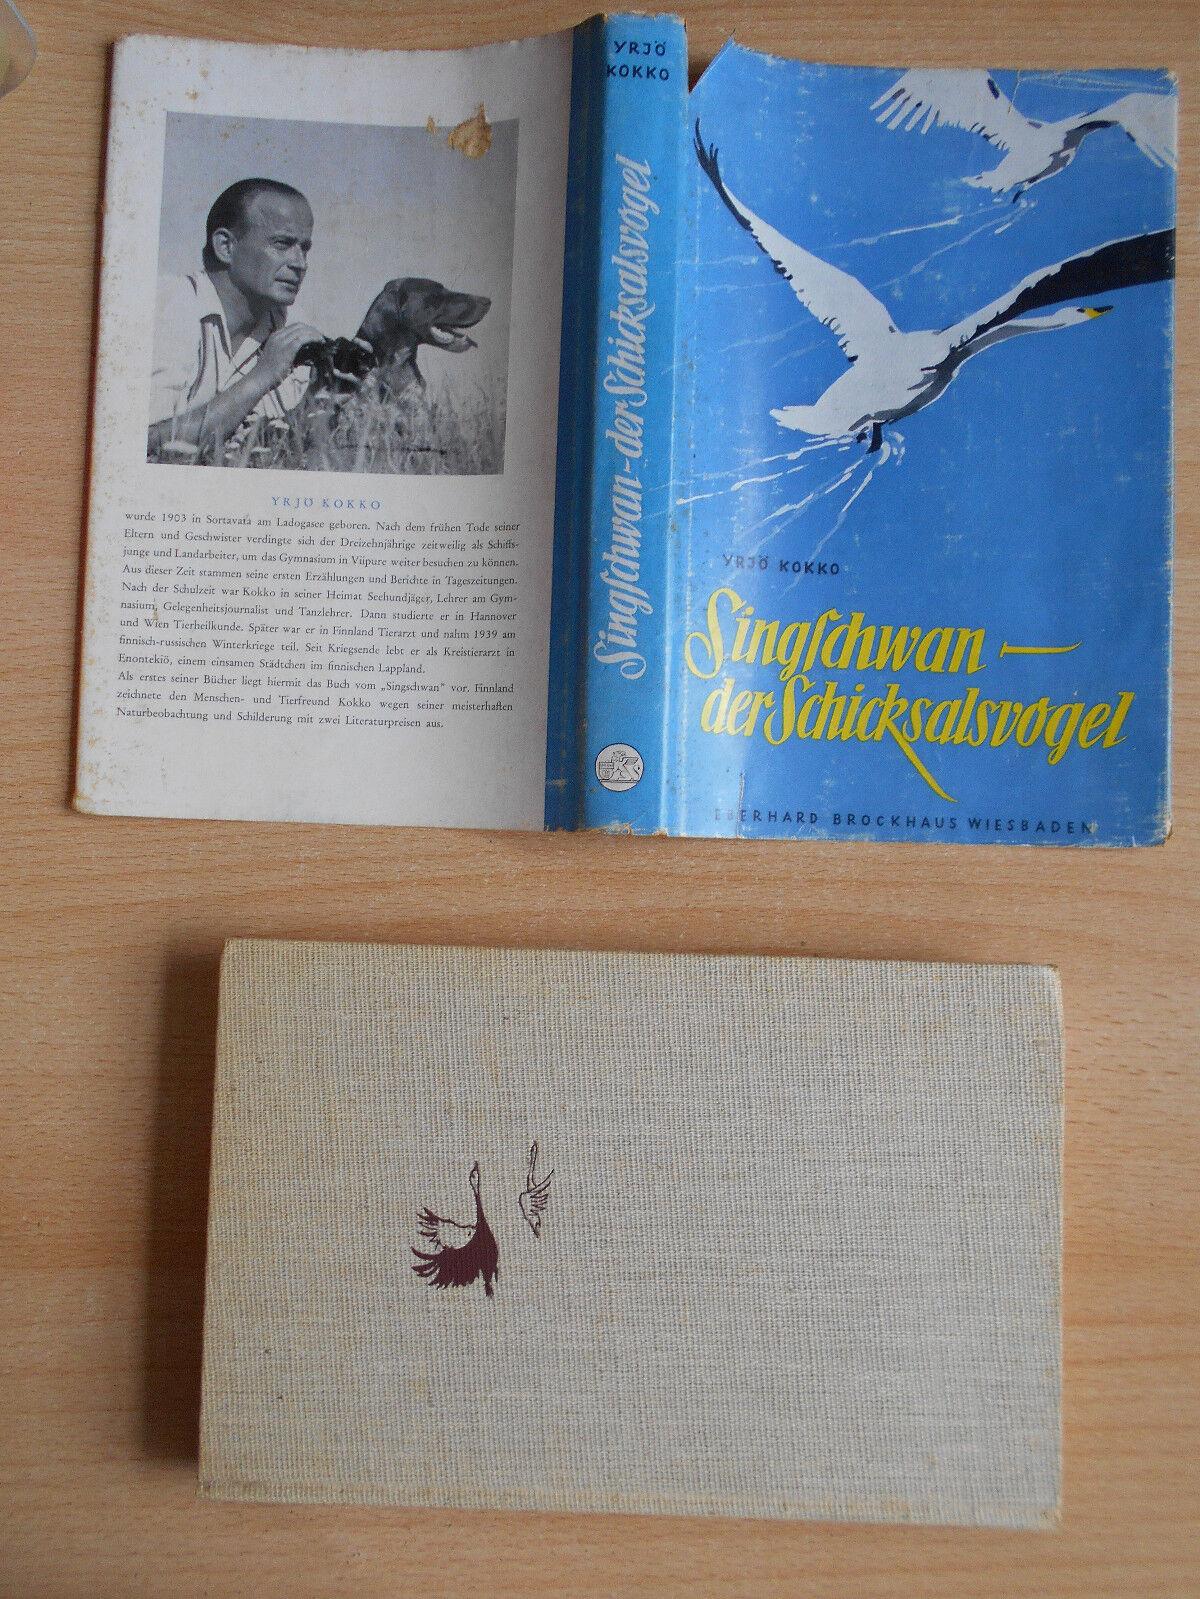 Kokko , Yrjö Singschwan - Der Schicksalsvogel das Wunder in Ultima Thule